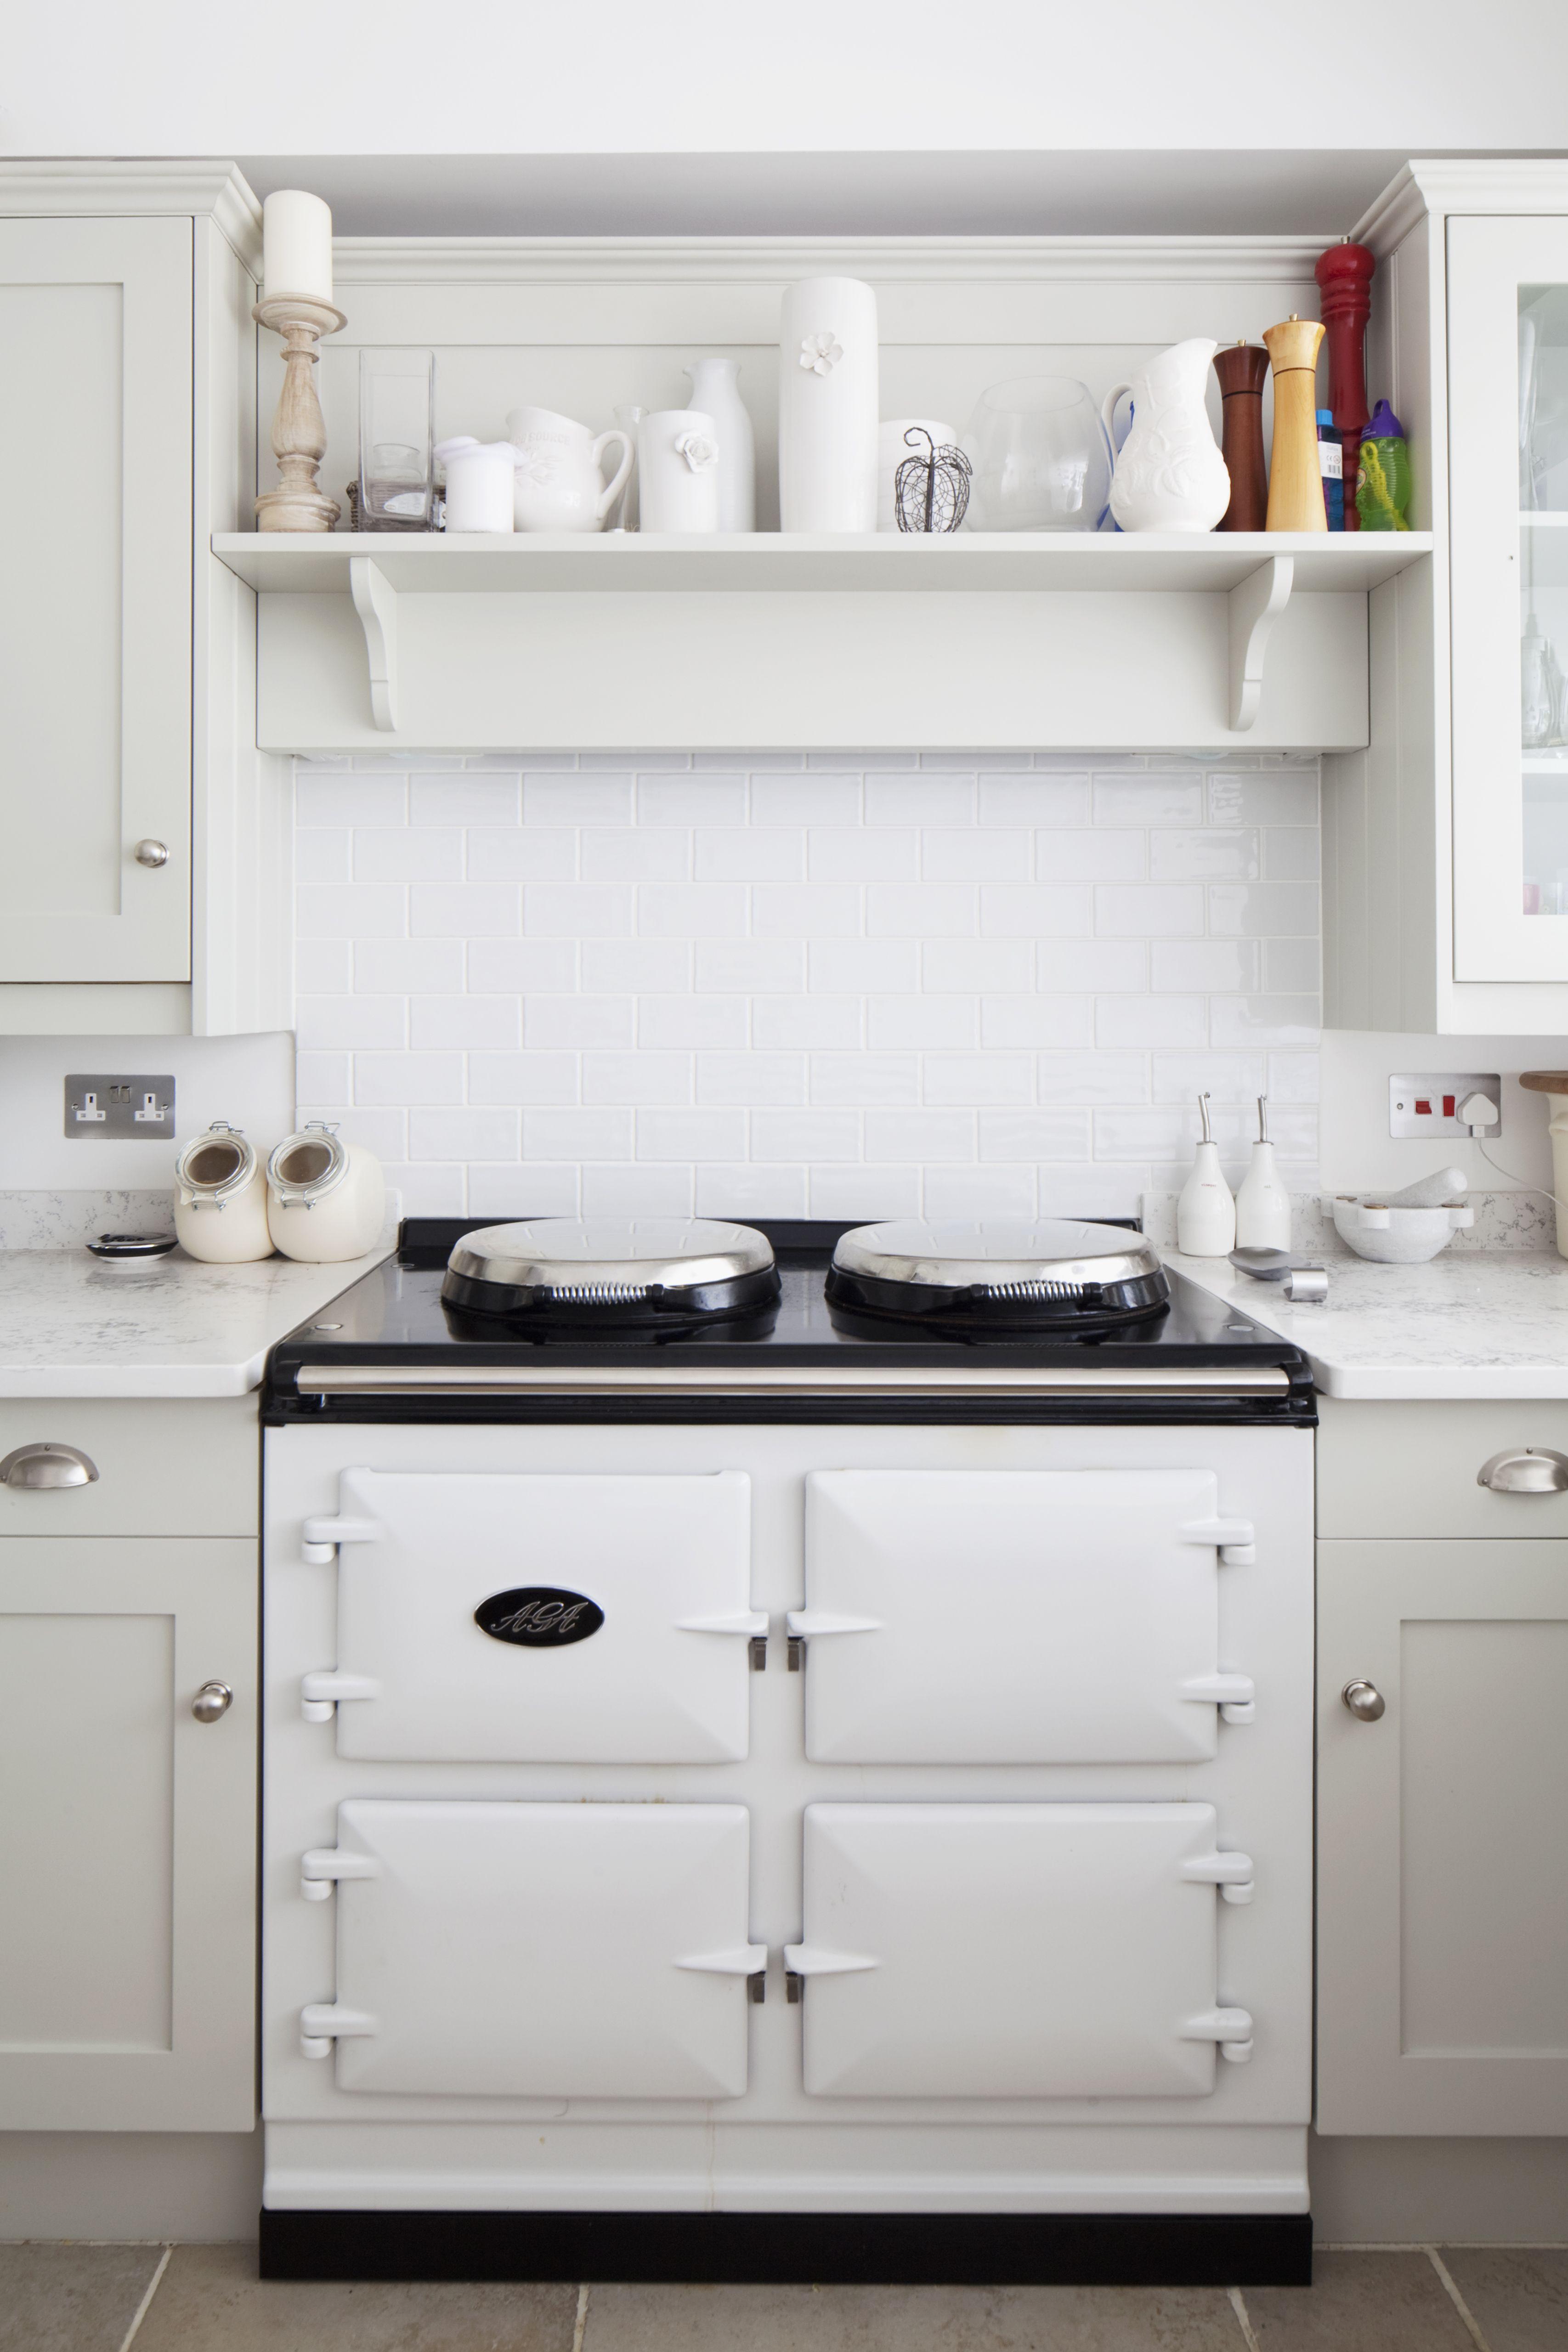 Modern Aga range cooker to shaker style kitchen | Brighton ...